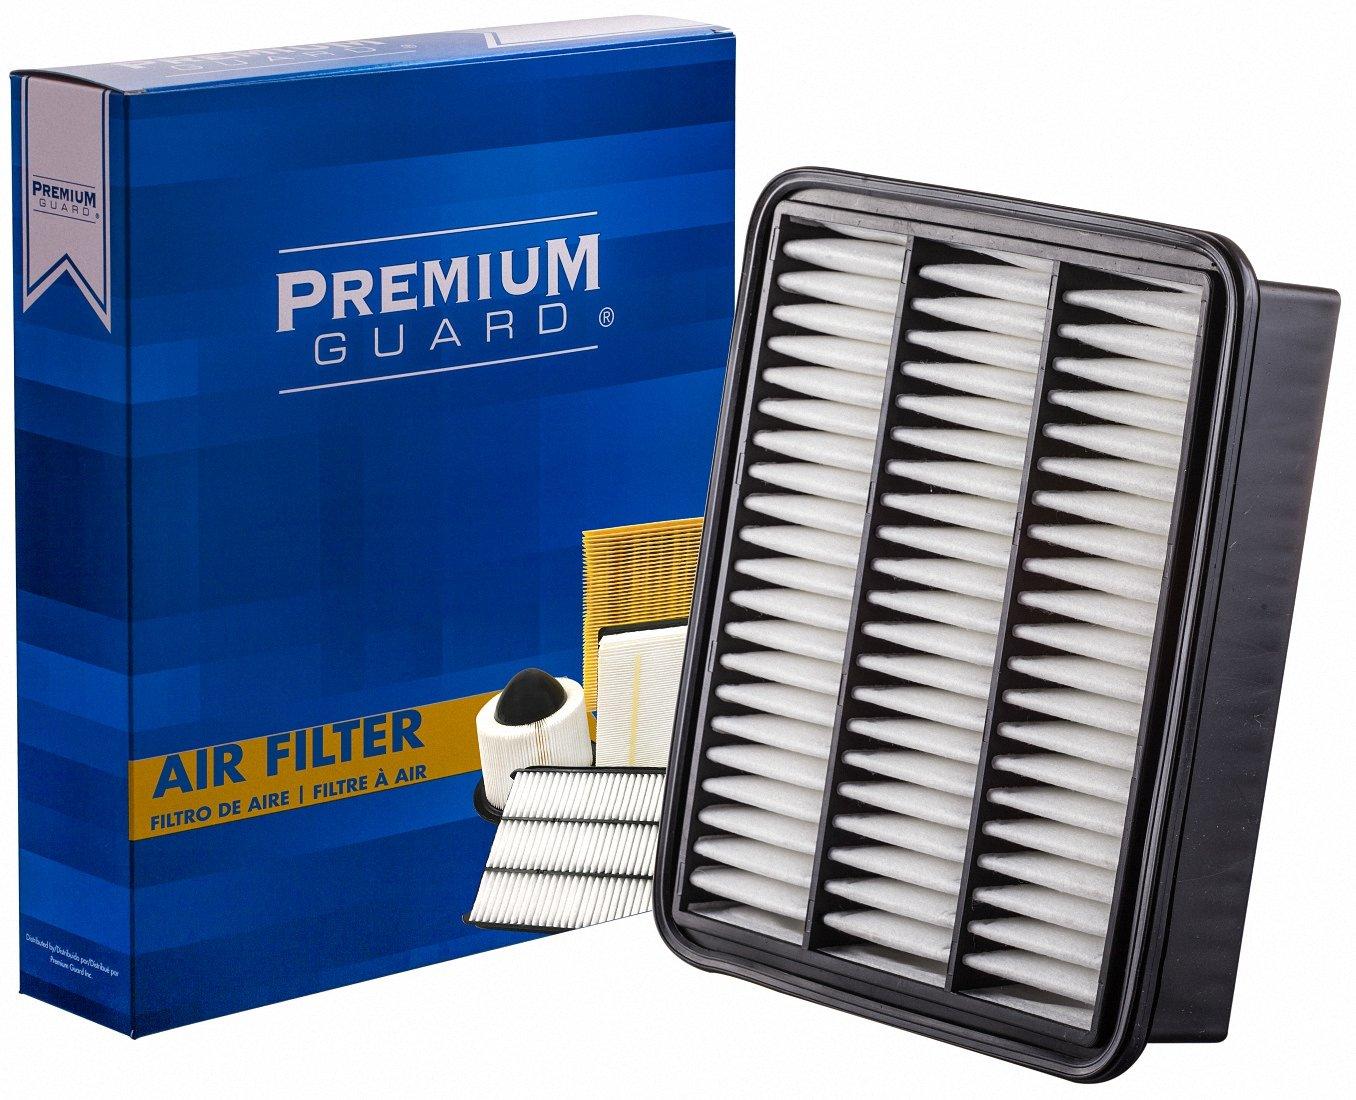 PG Air Filter PA99223 Fits 2016-18 Mazda CX-9 Premium Guard